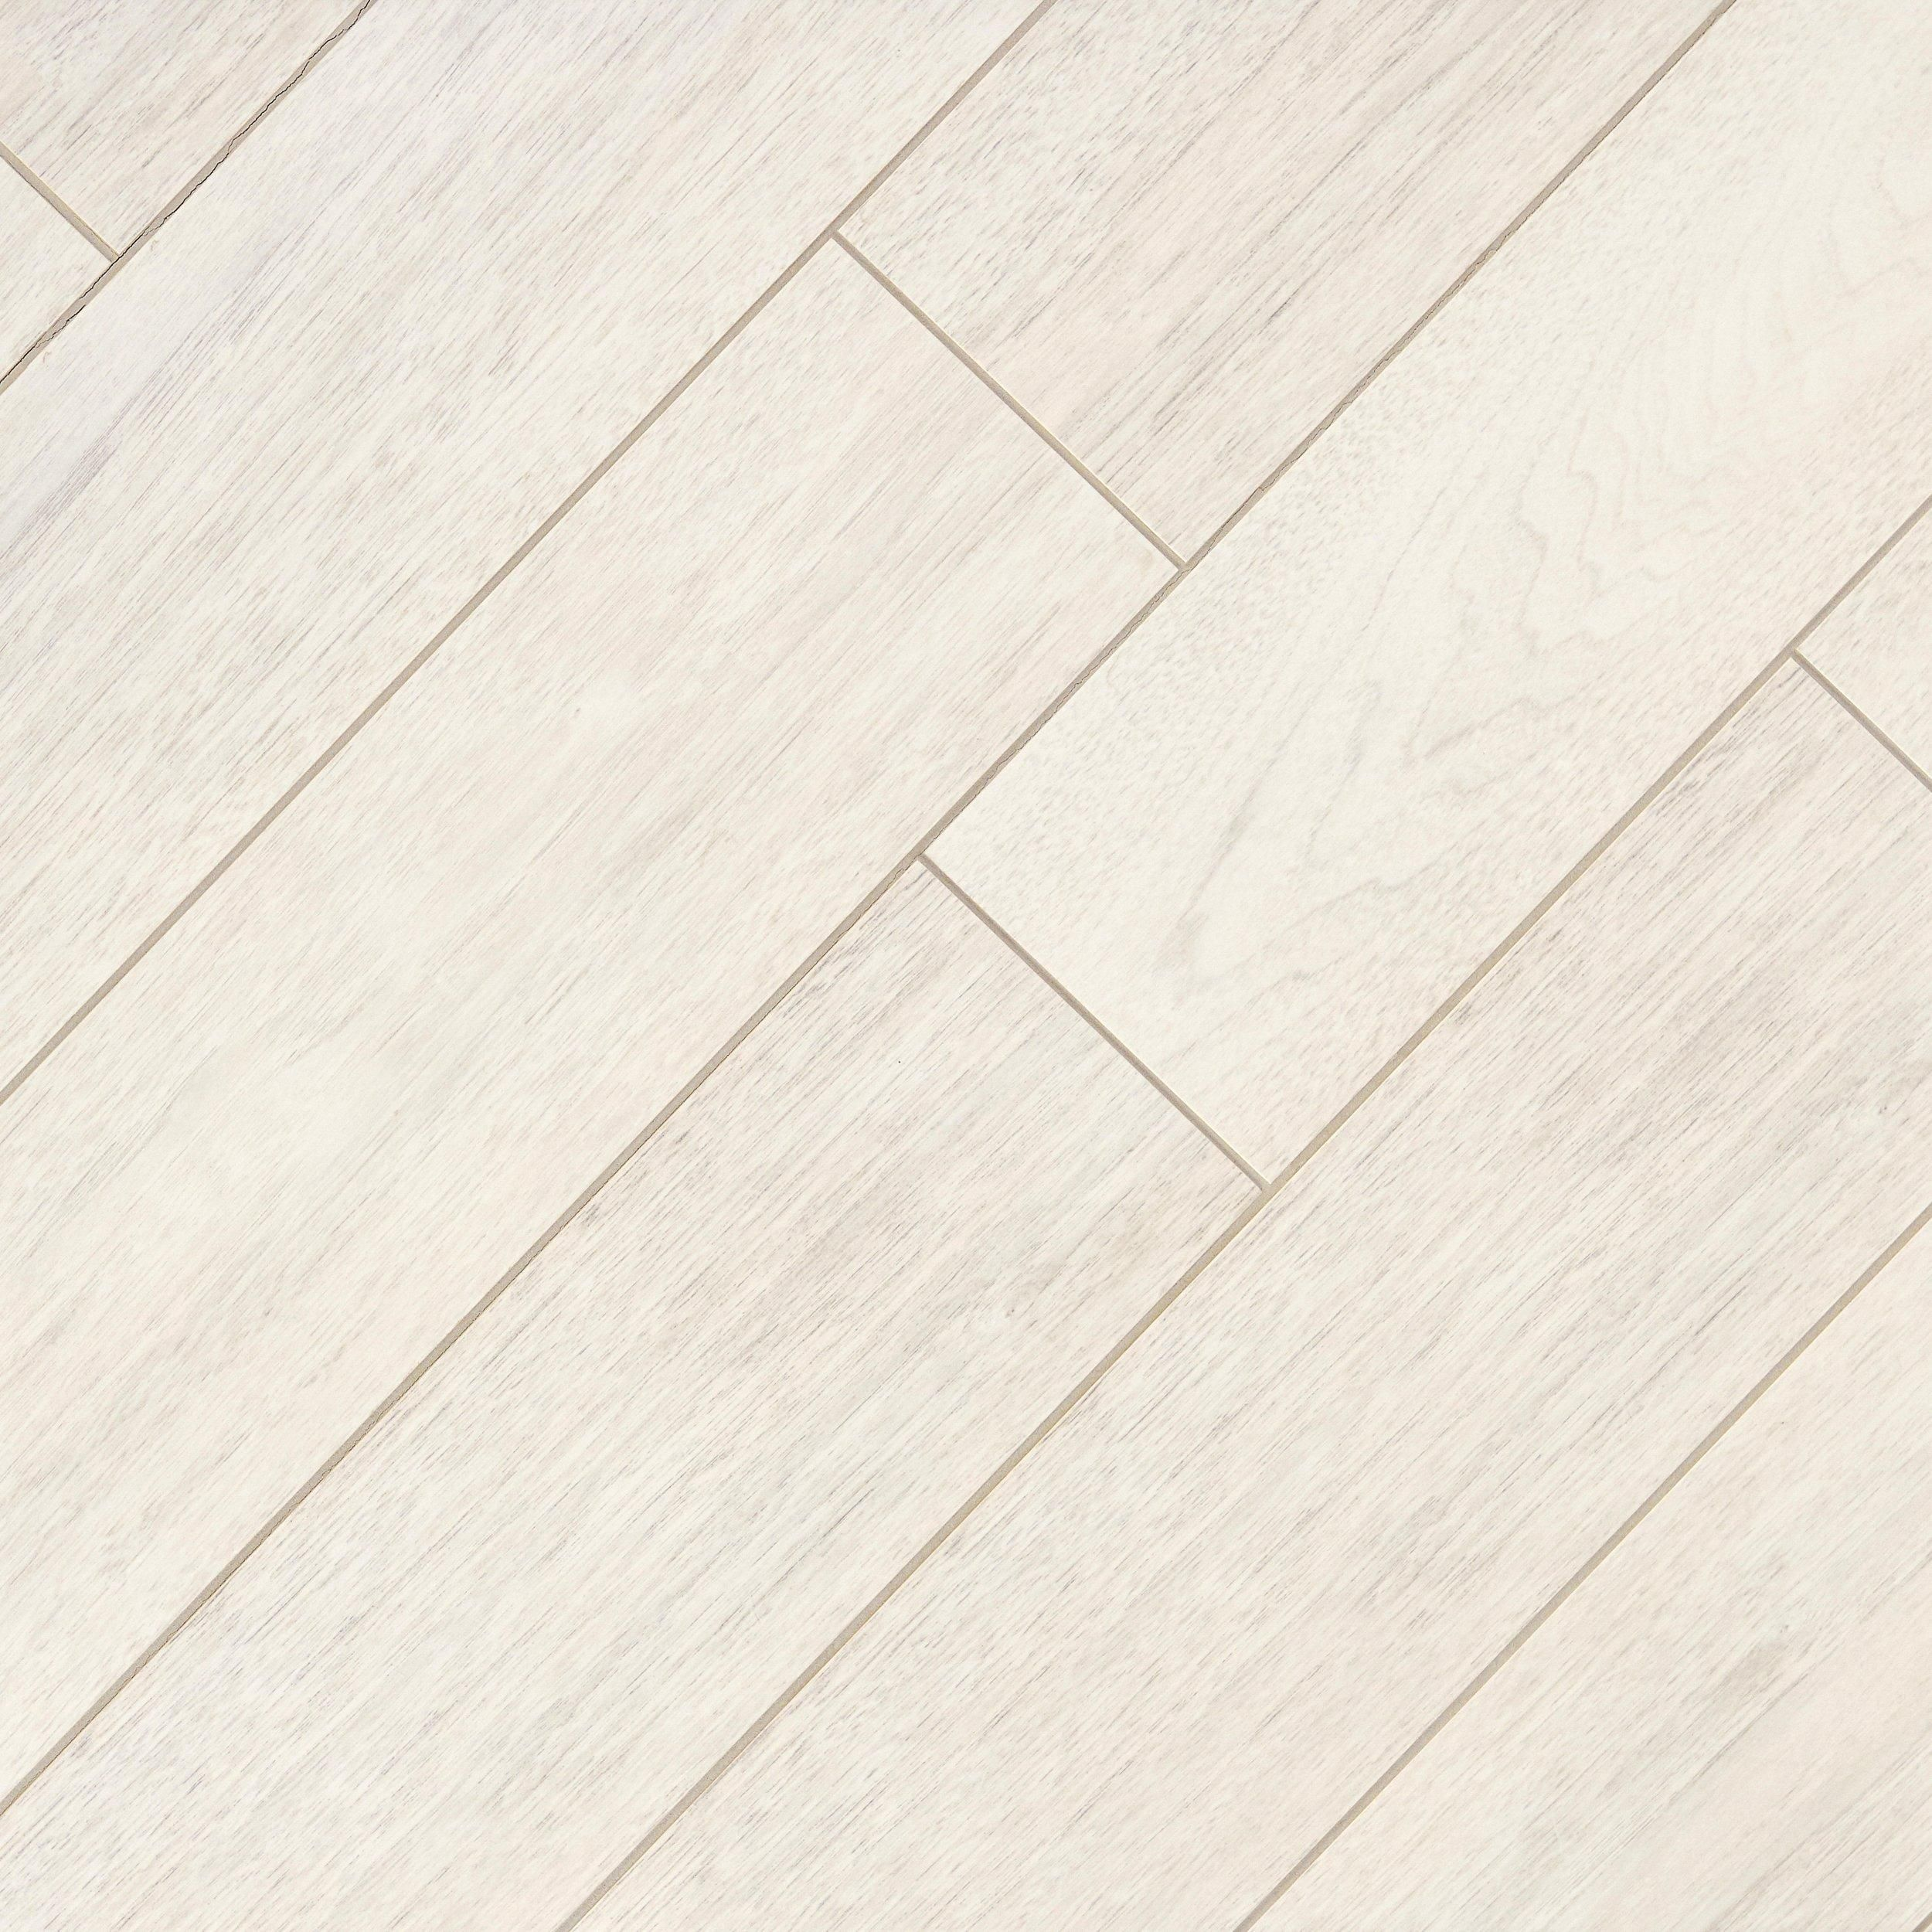 Newtron White Wood Plank Porcelain Tile Products